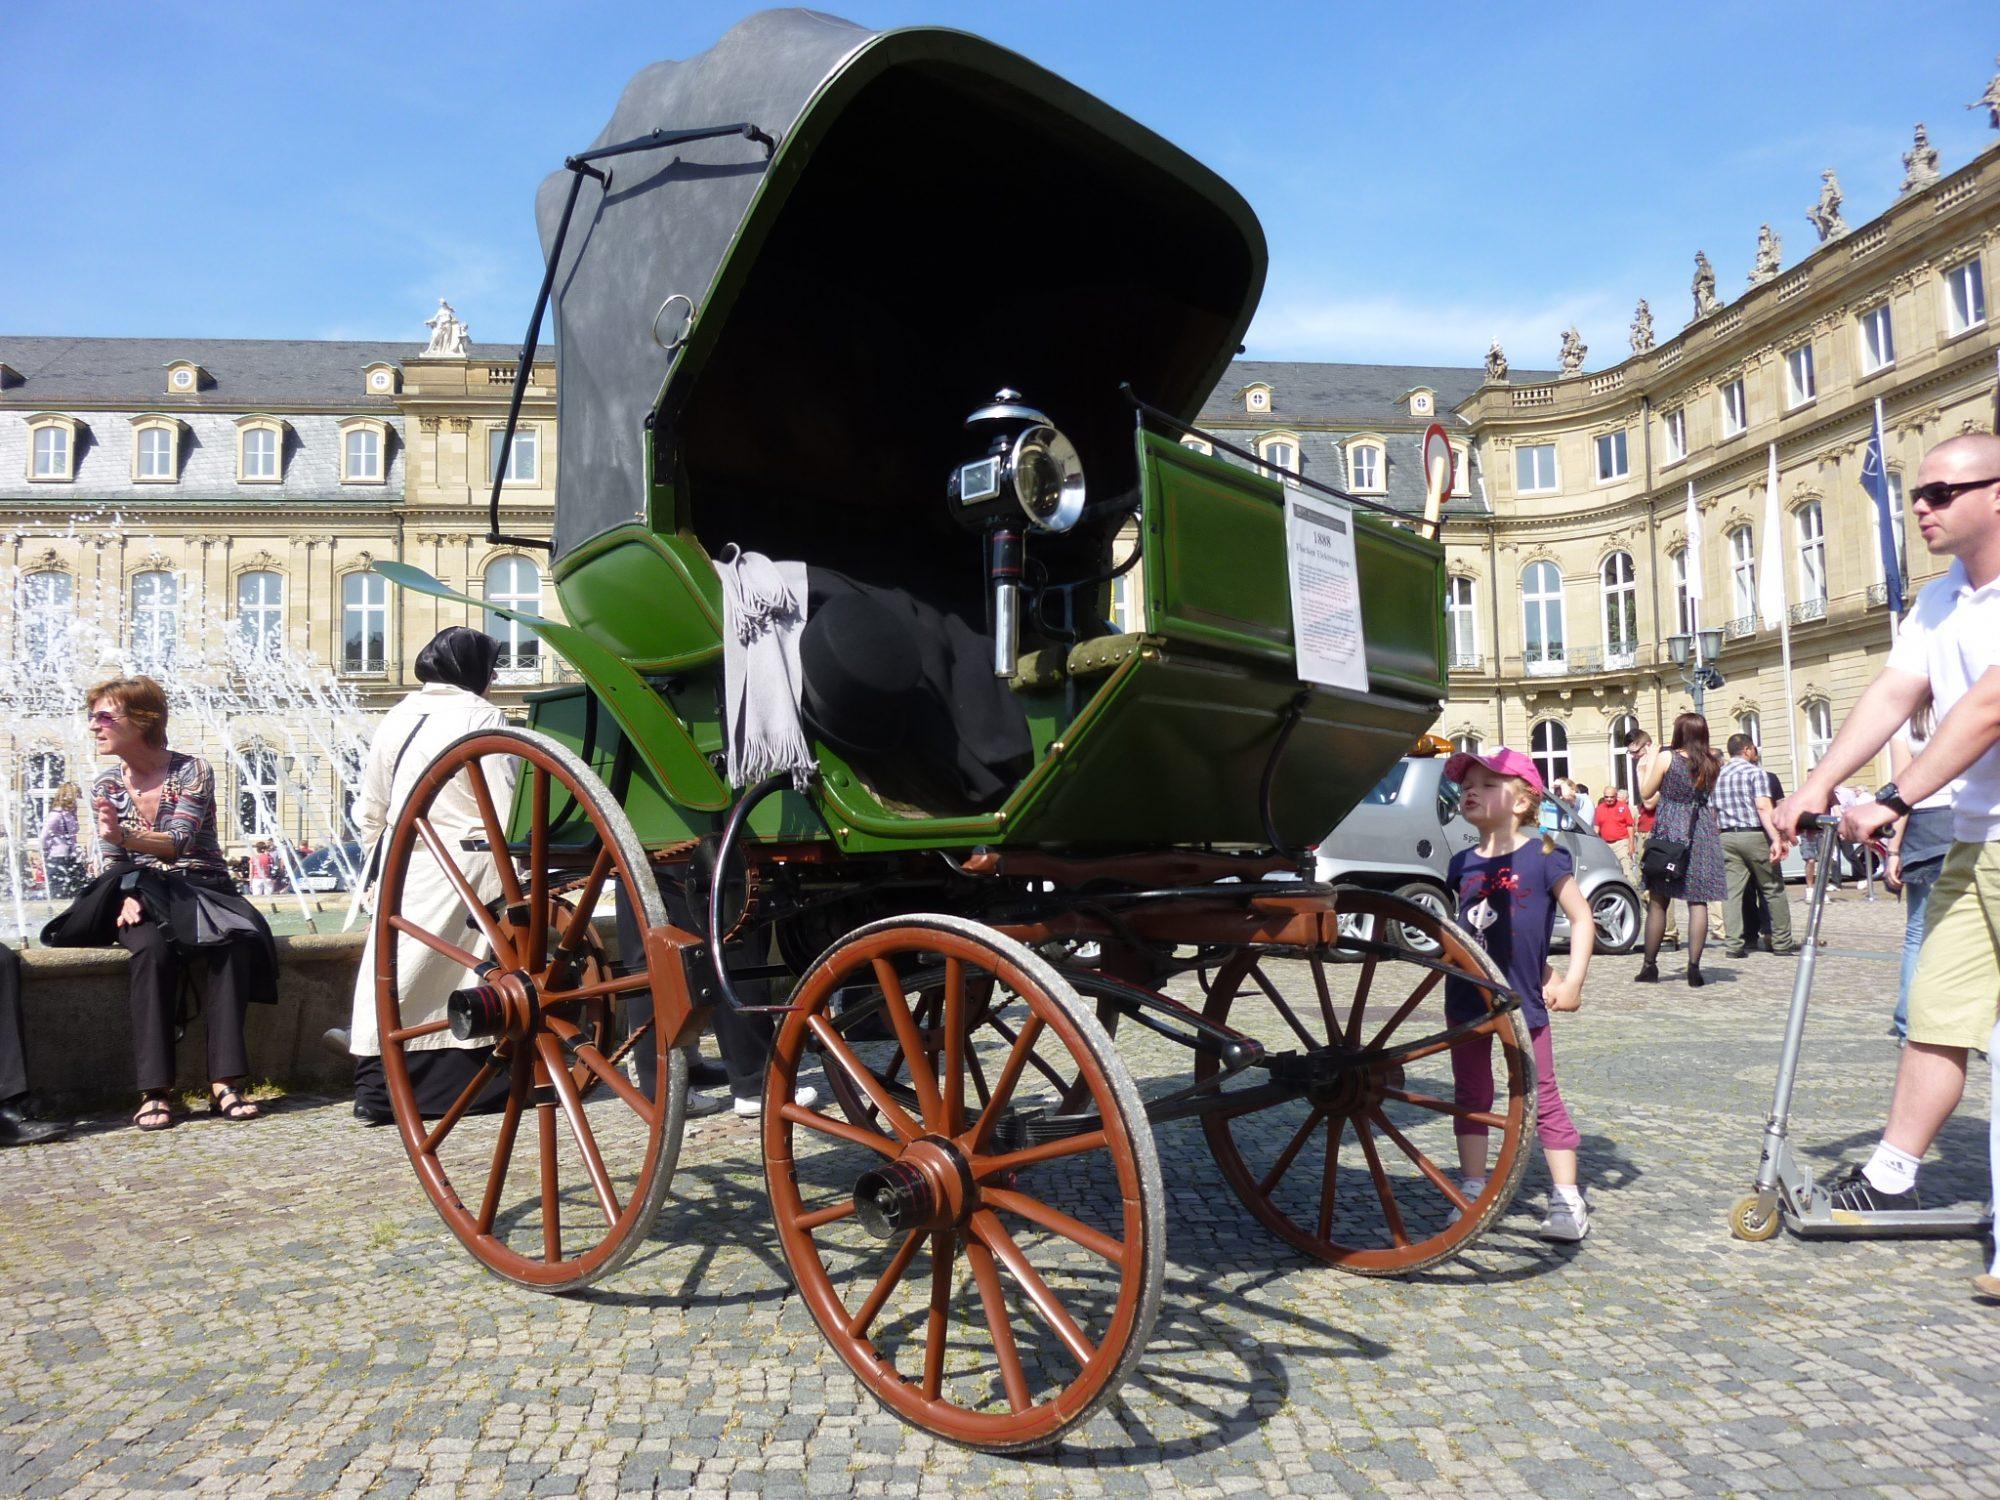 EV, electric car, electric vehicle, Flocken, Elektrowagen